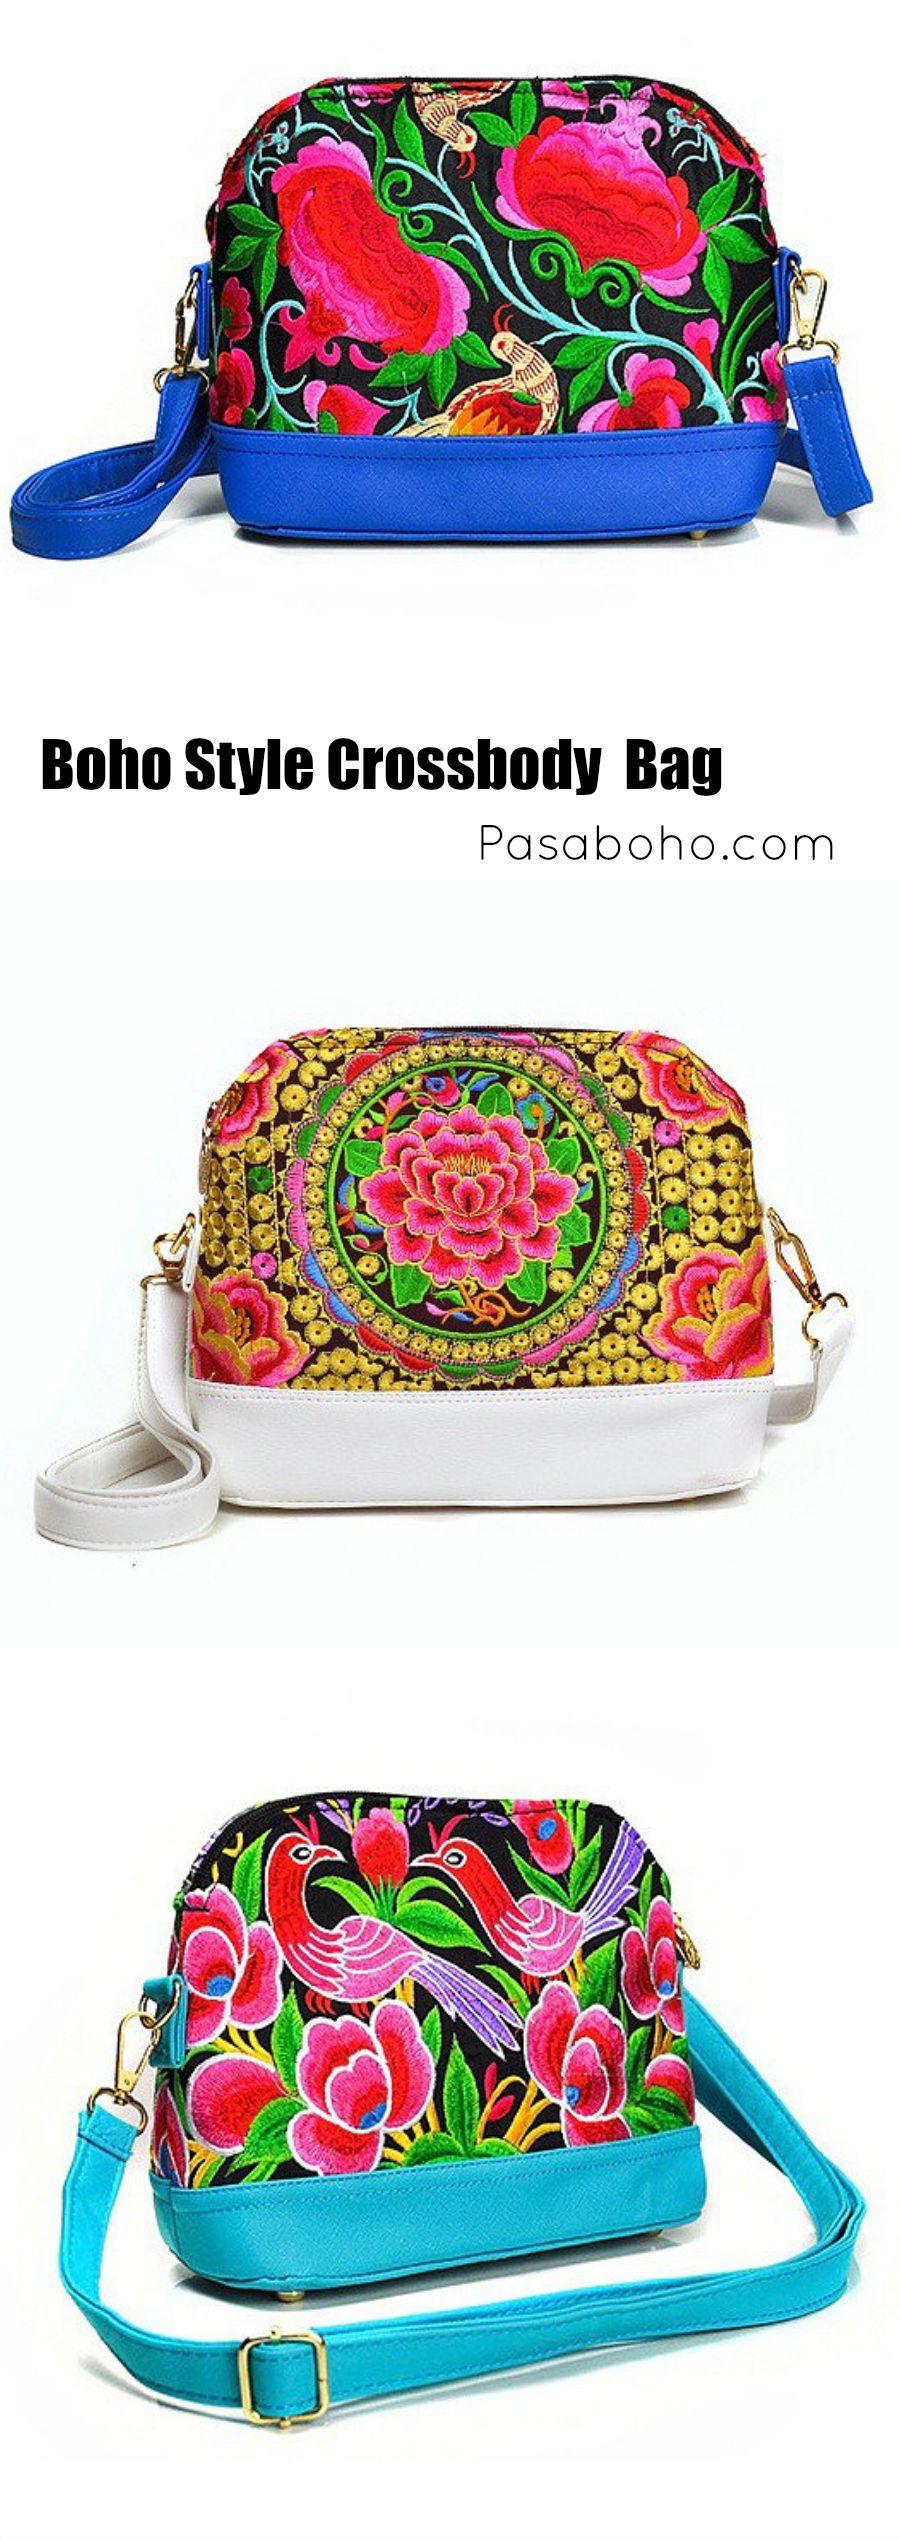 Available $36 (Free Shipping Worldwide) - Boho Style Crossbody Bag ...